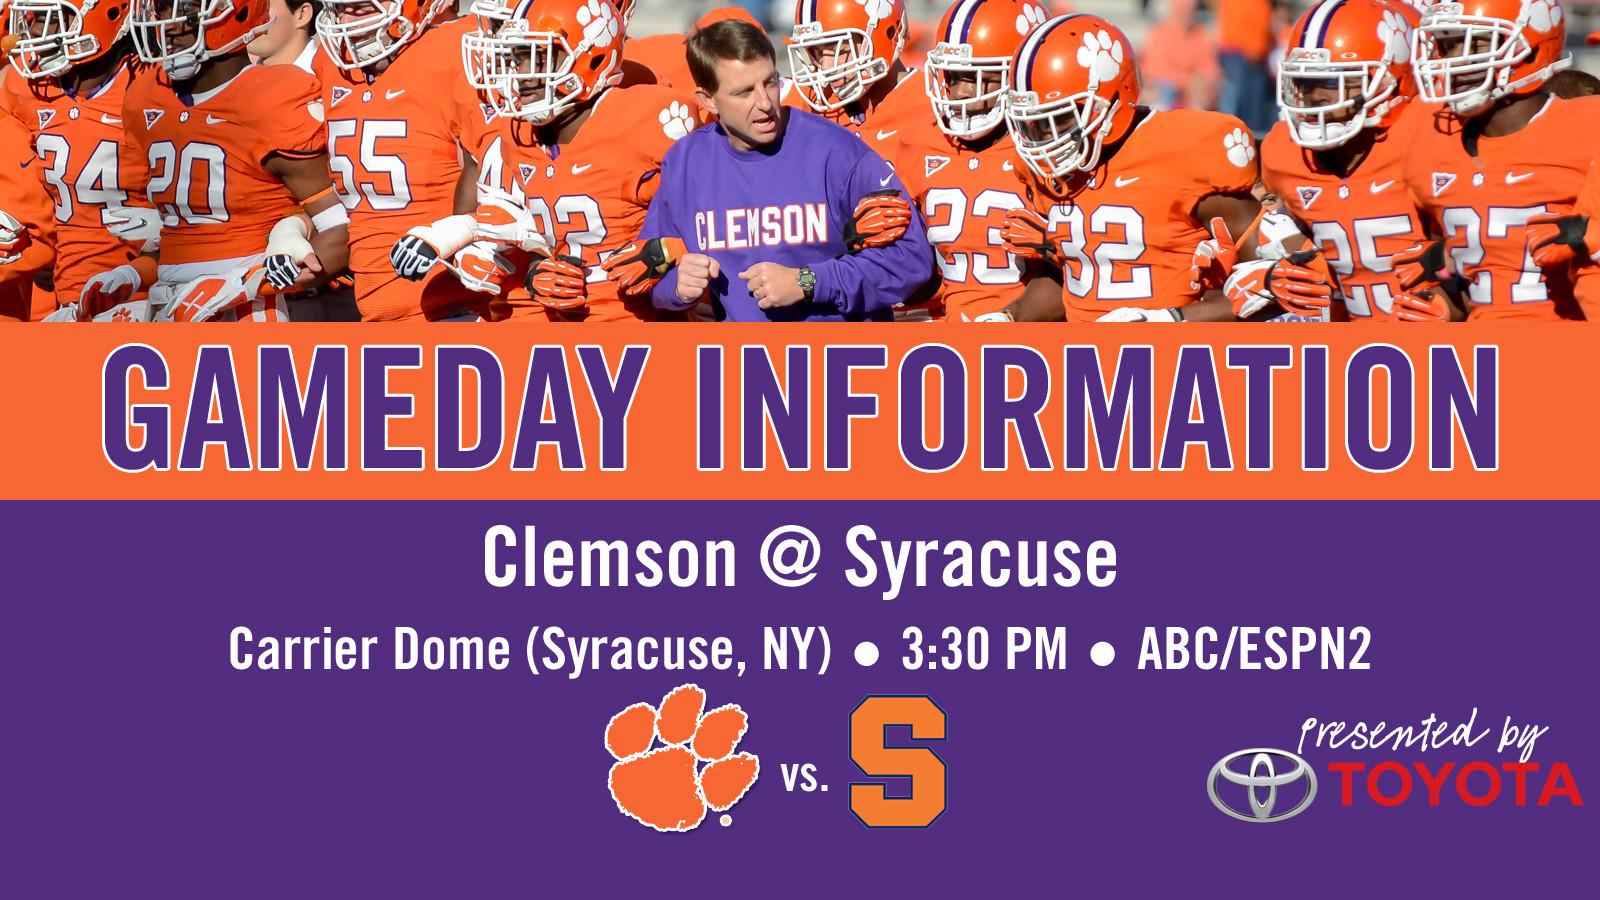 Clemson @ Syracuse Football Gameday Information